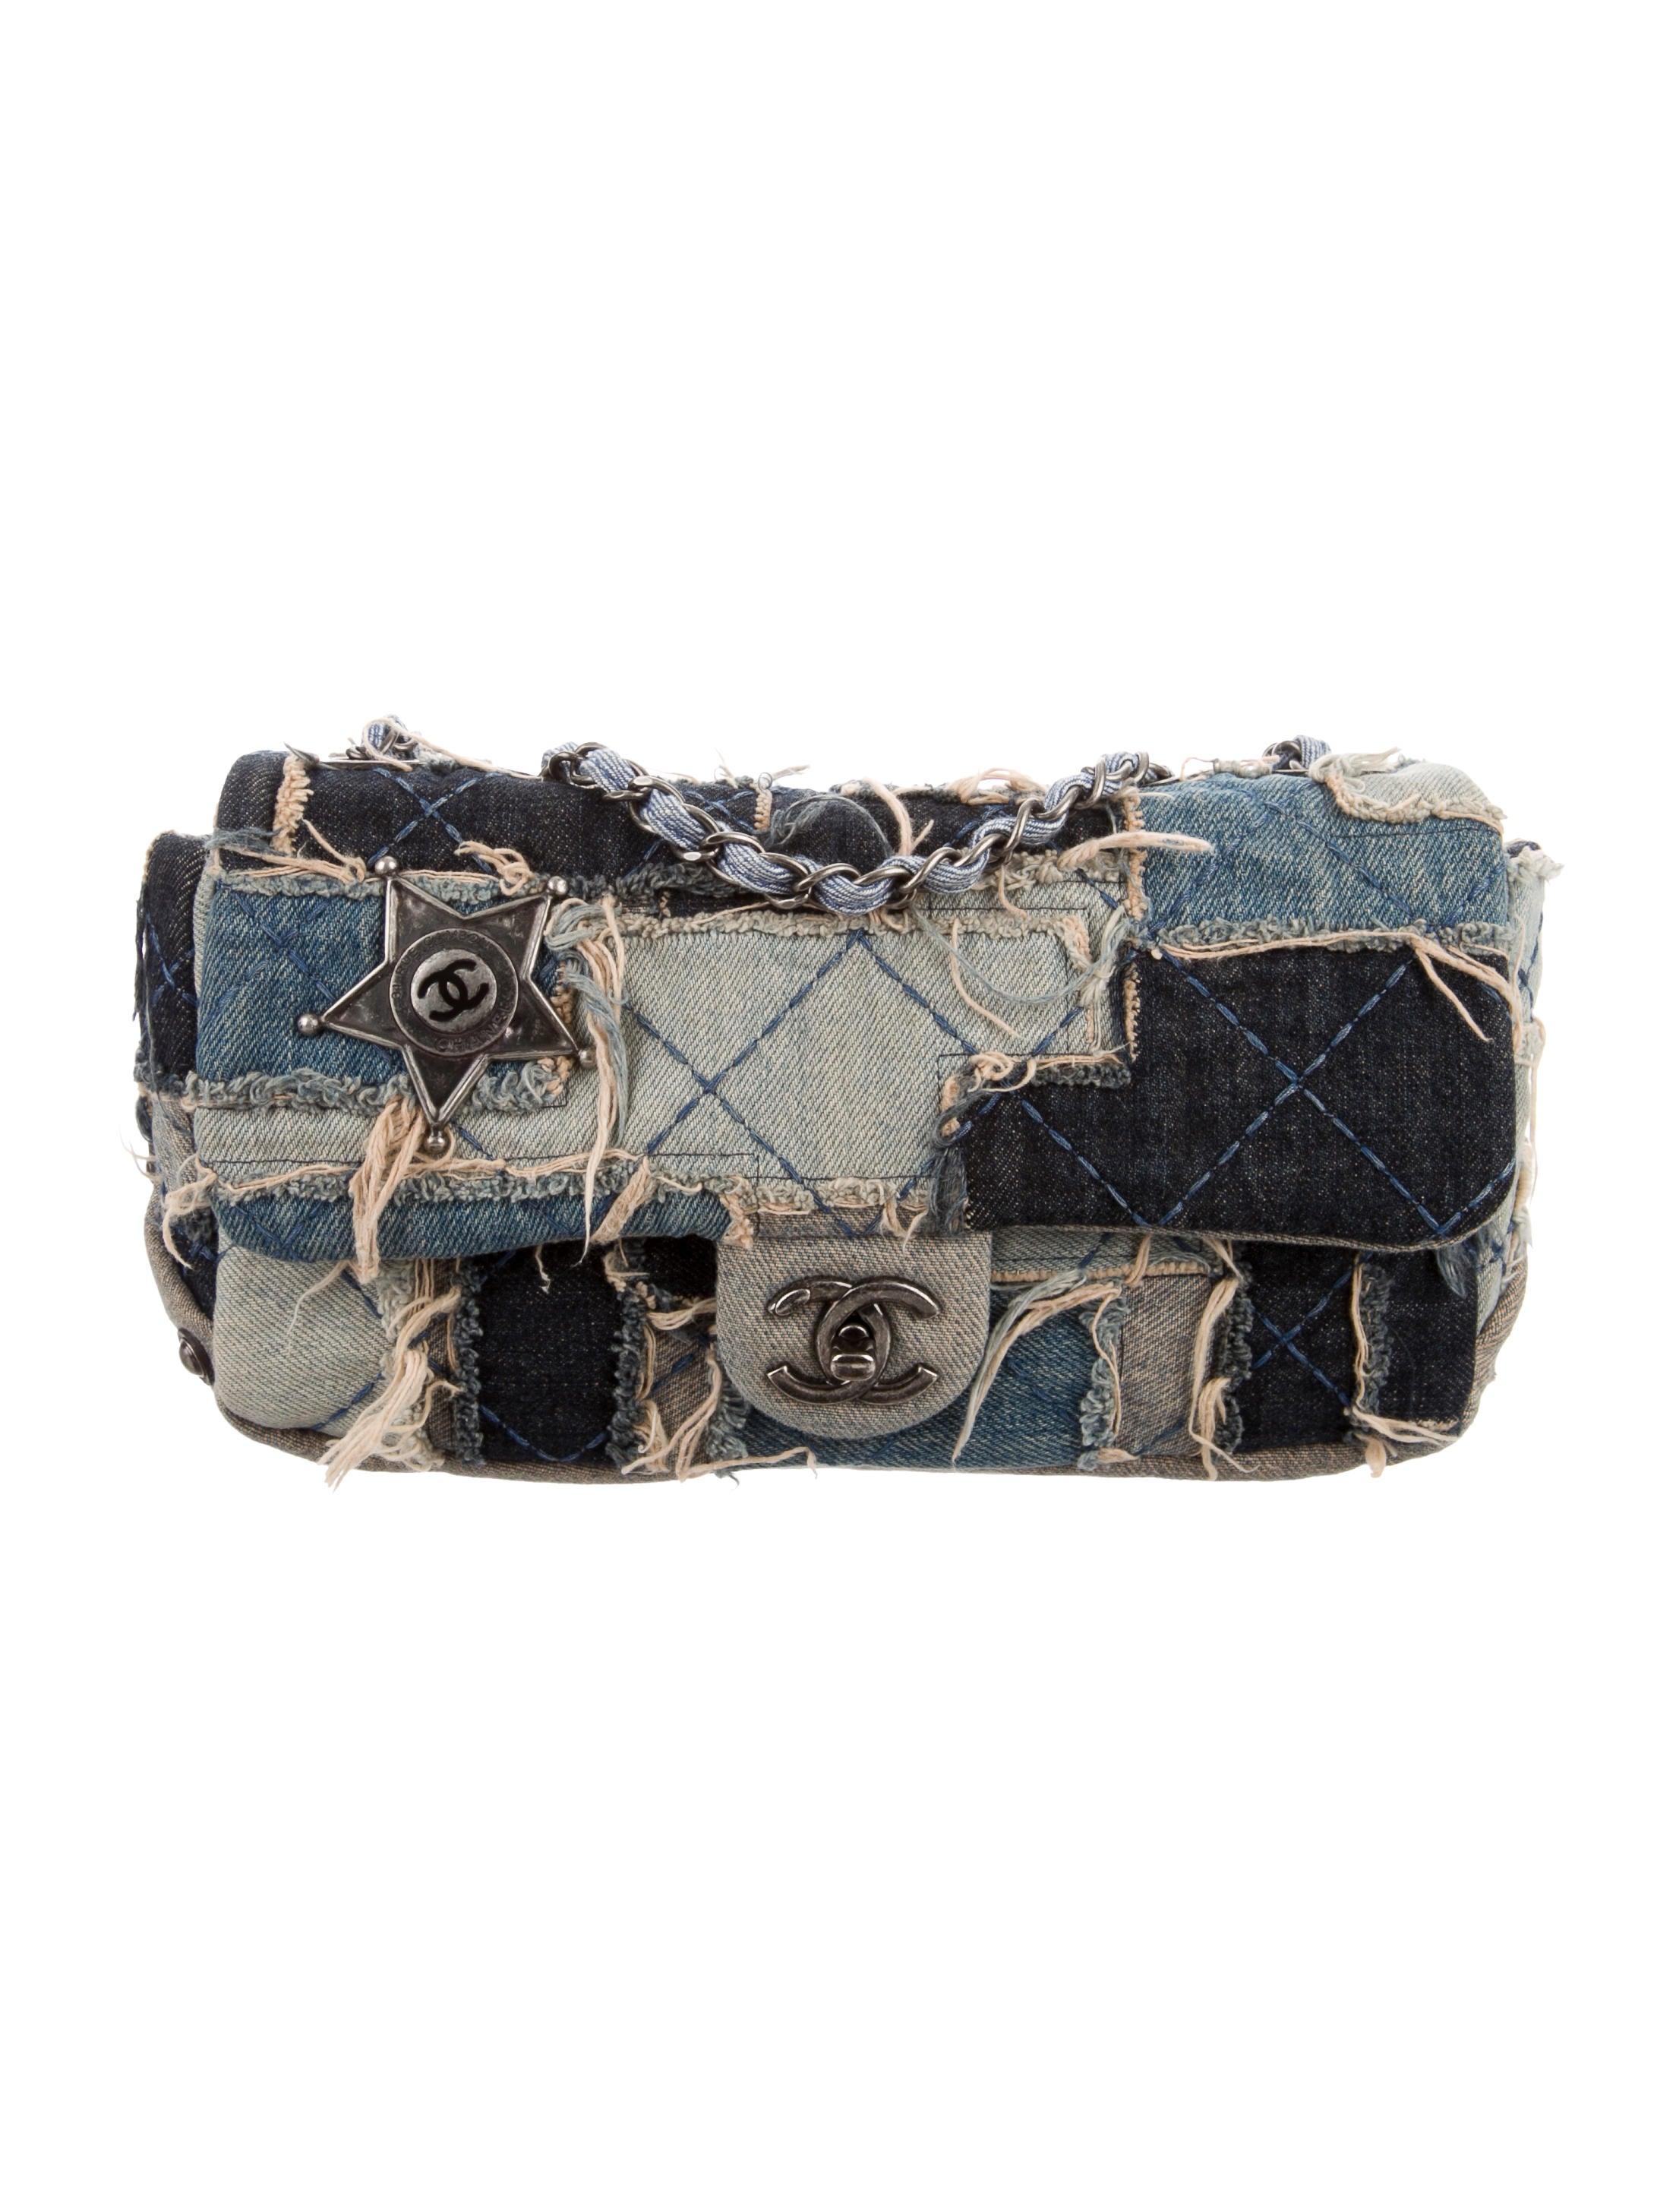 520e0dcf05b0 Chanel Paris-Dallas Denim Flap Bag - Handbags - CHA124953 | The RealReal